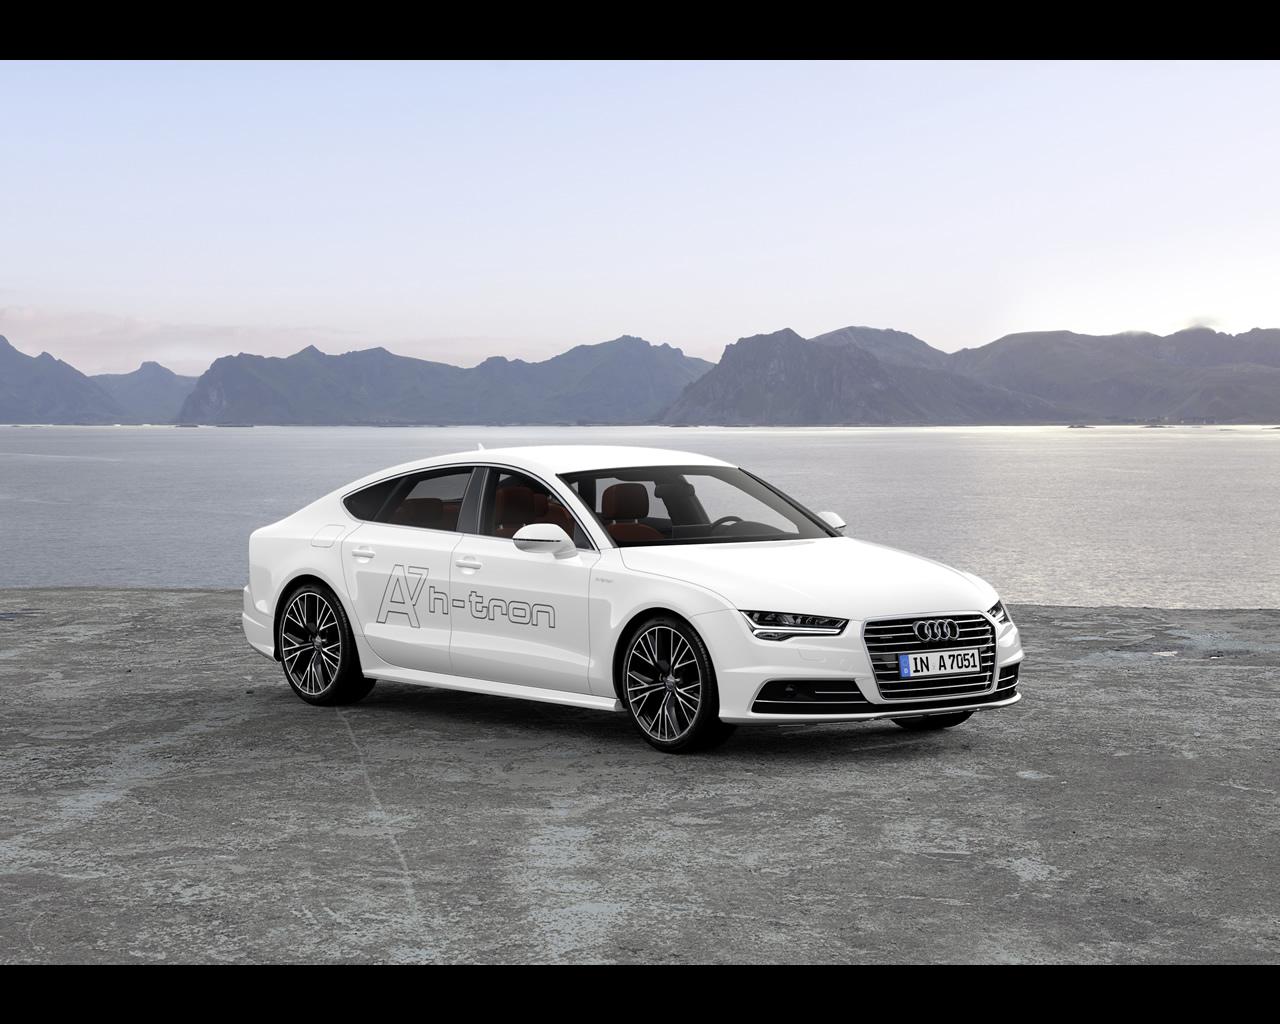 audi a7 sportback h tron quattro hydrogen fuel cell concept 2014. Black Bedroom Furniture Sets. Home Design Ideas